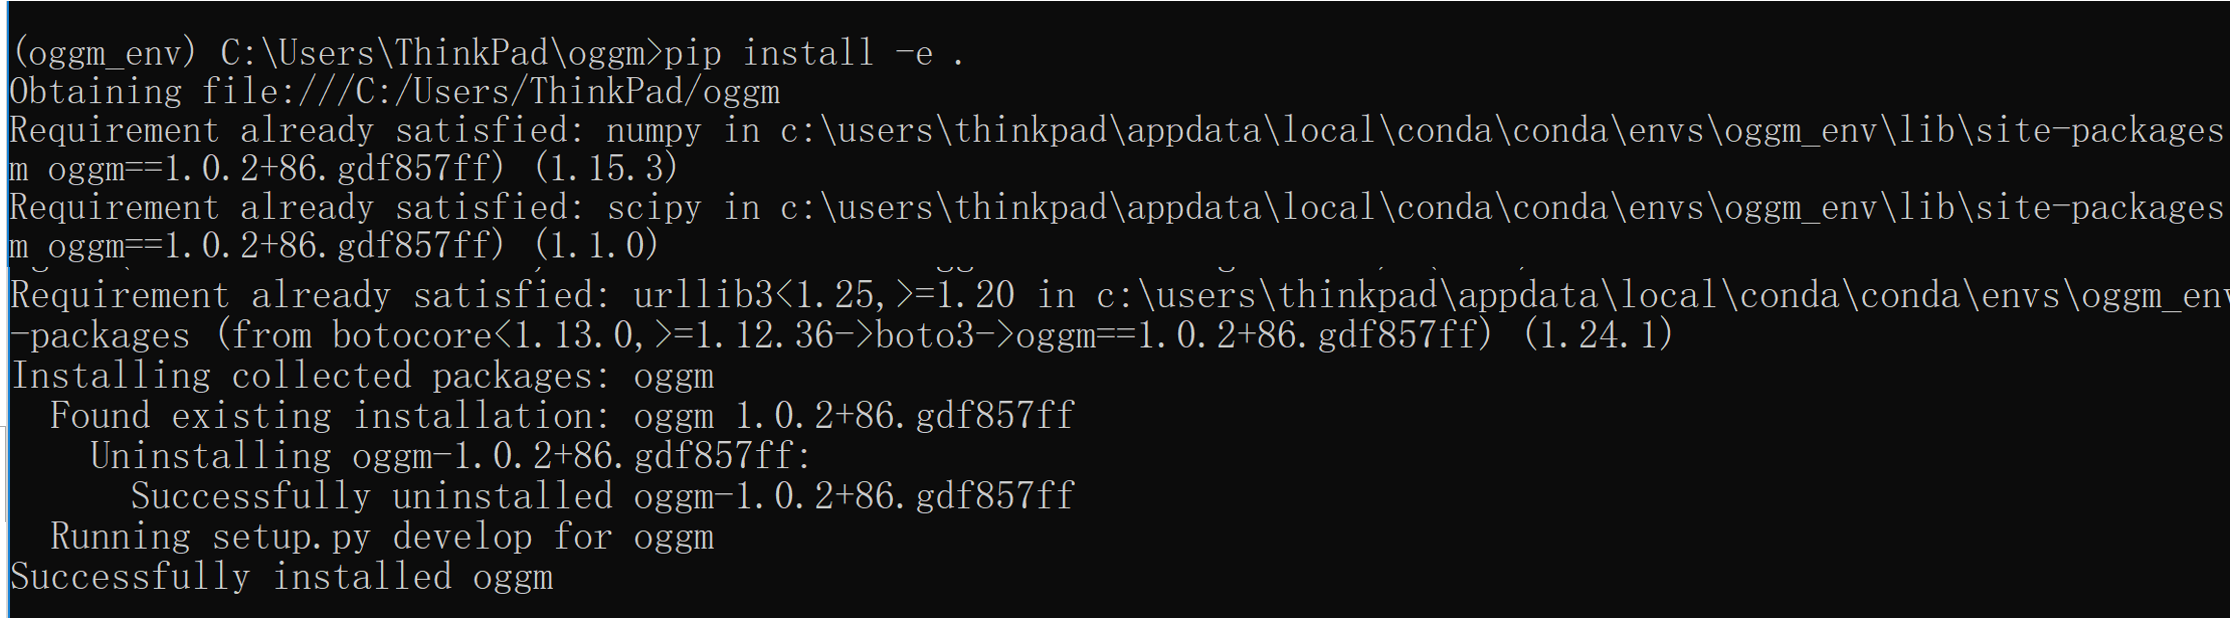 Install OGGM failed in winodws10, Anaconda (python 3 6